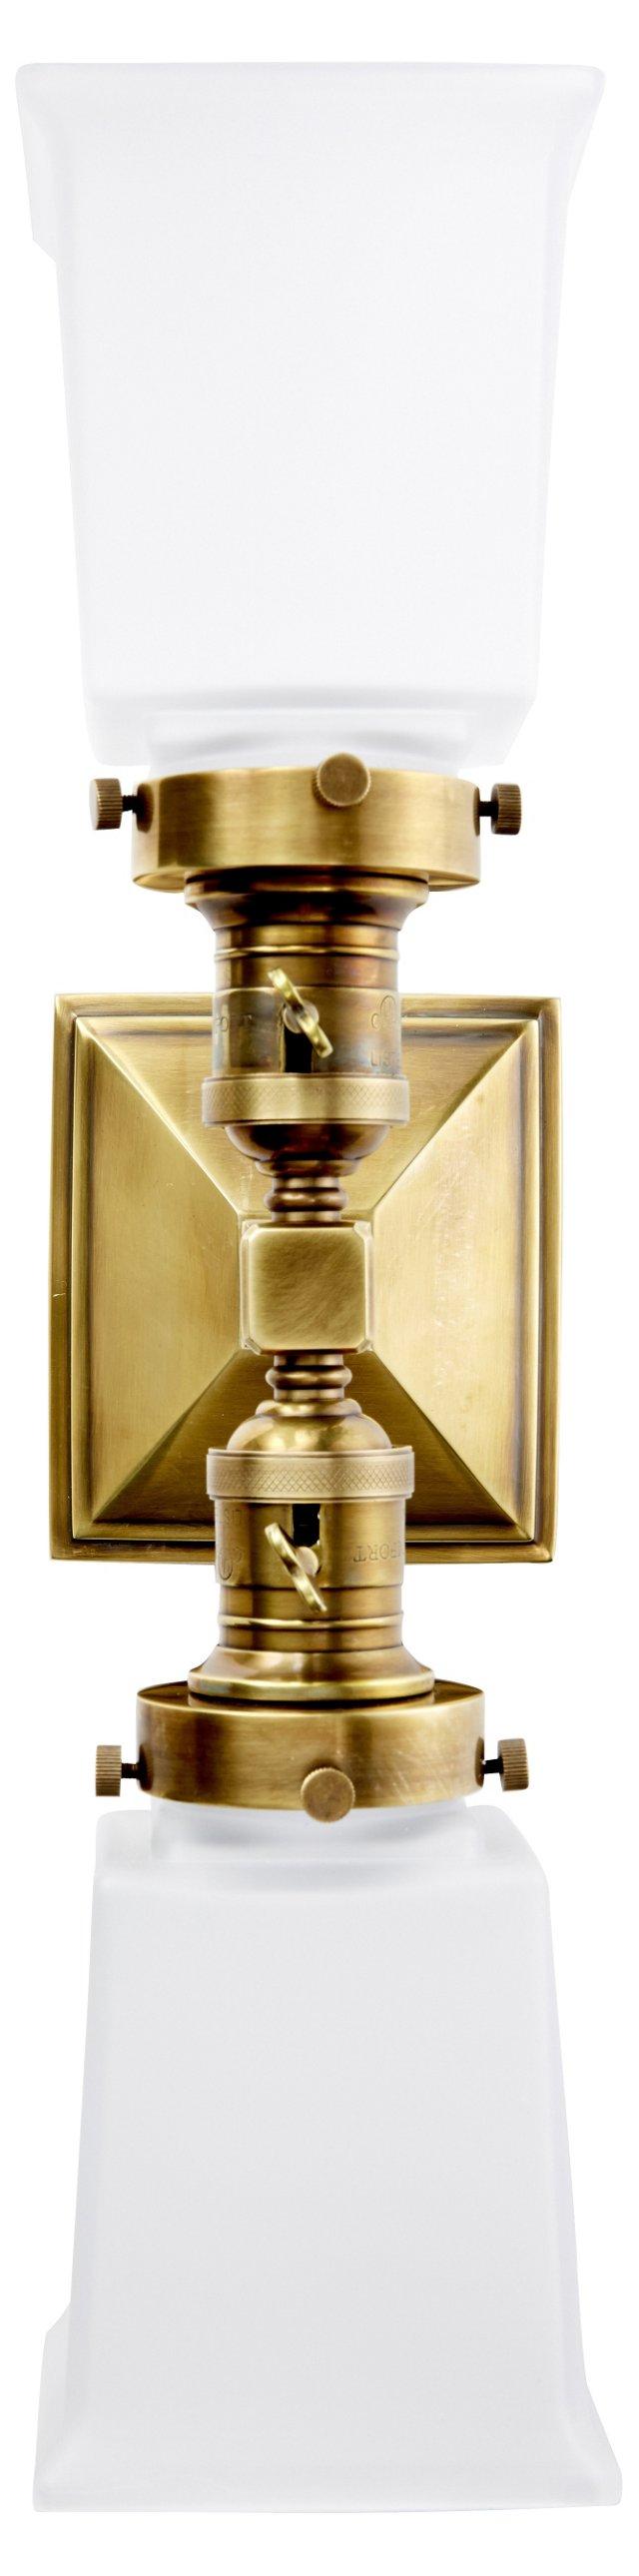 Boston Square Sconce, Brass